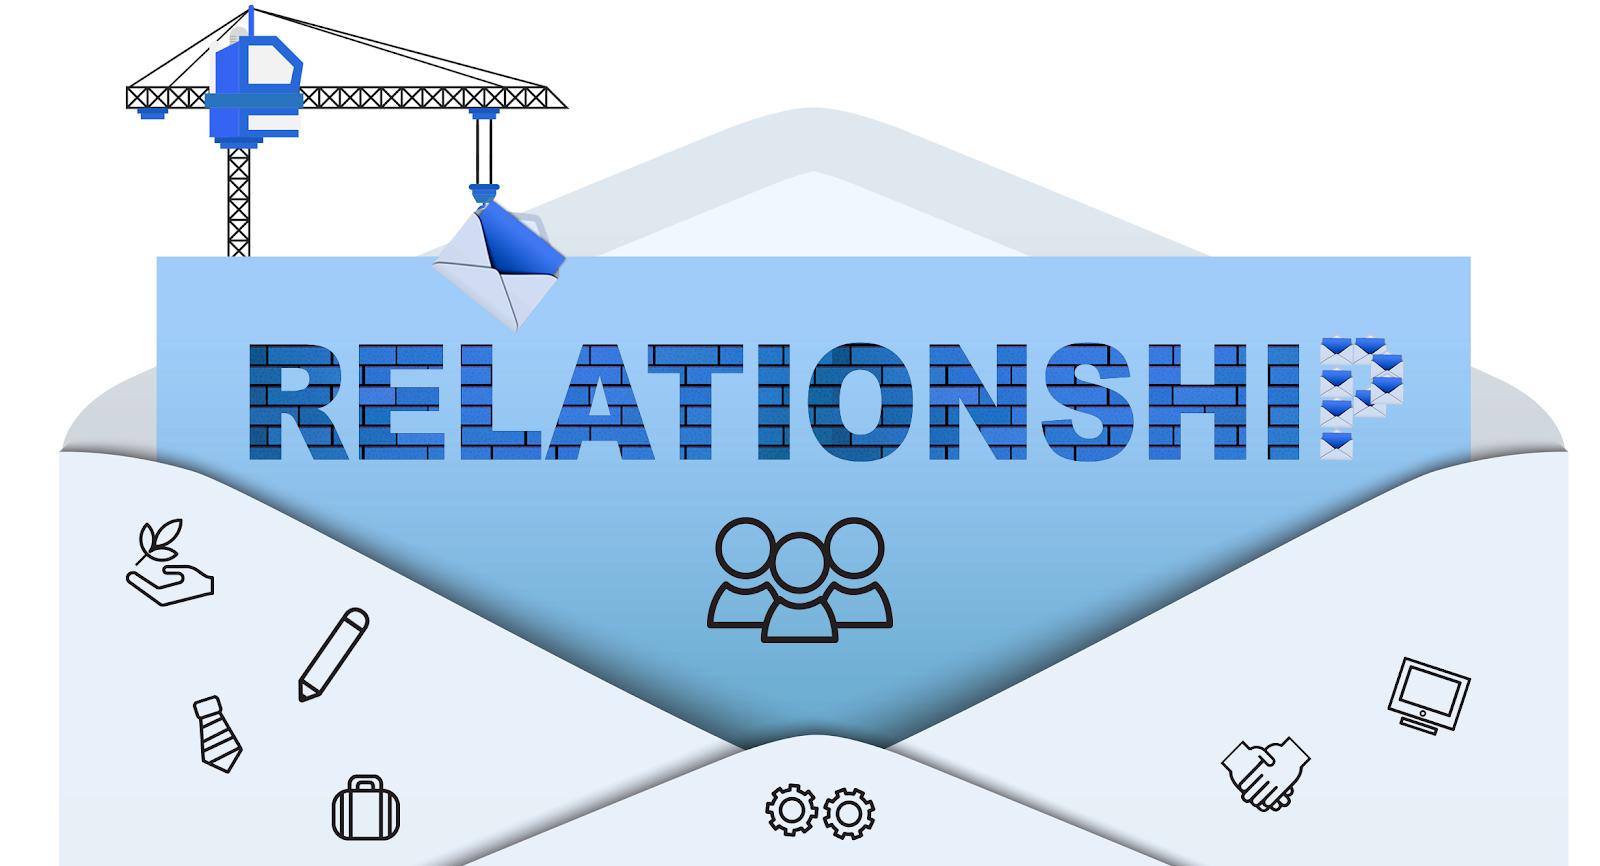 an illustration of an envelope bearing relationship